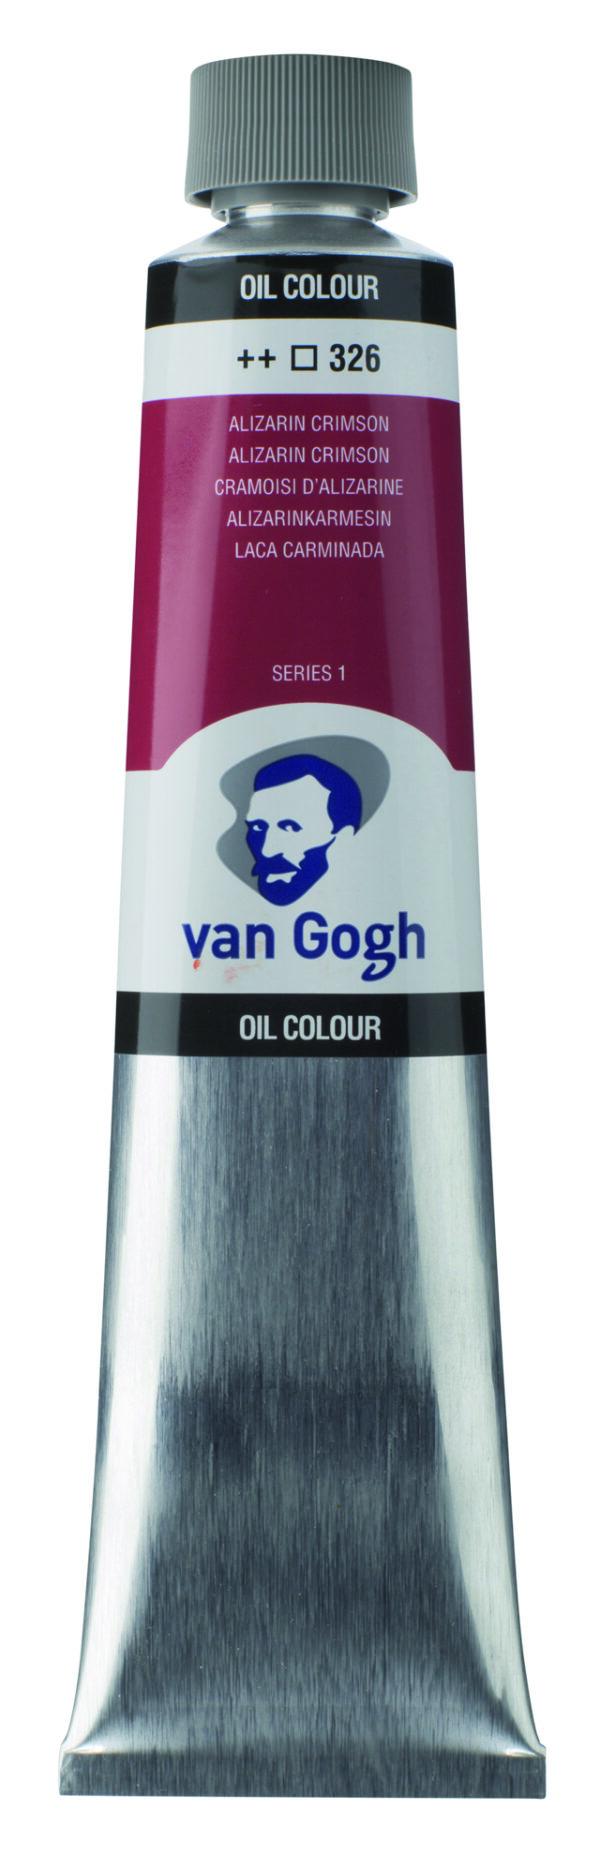 Van Gogh 326 Alizarin crimson - 200 ml